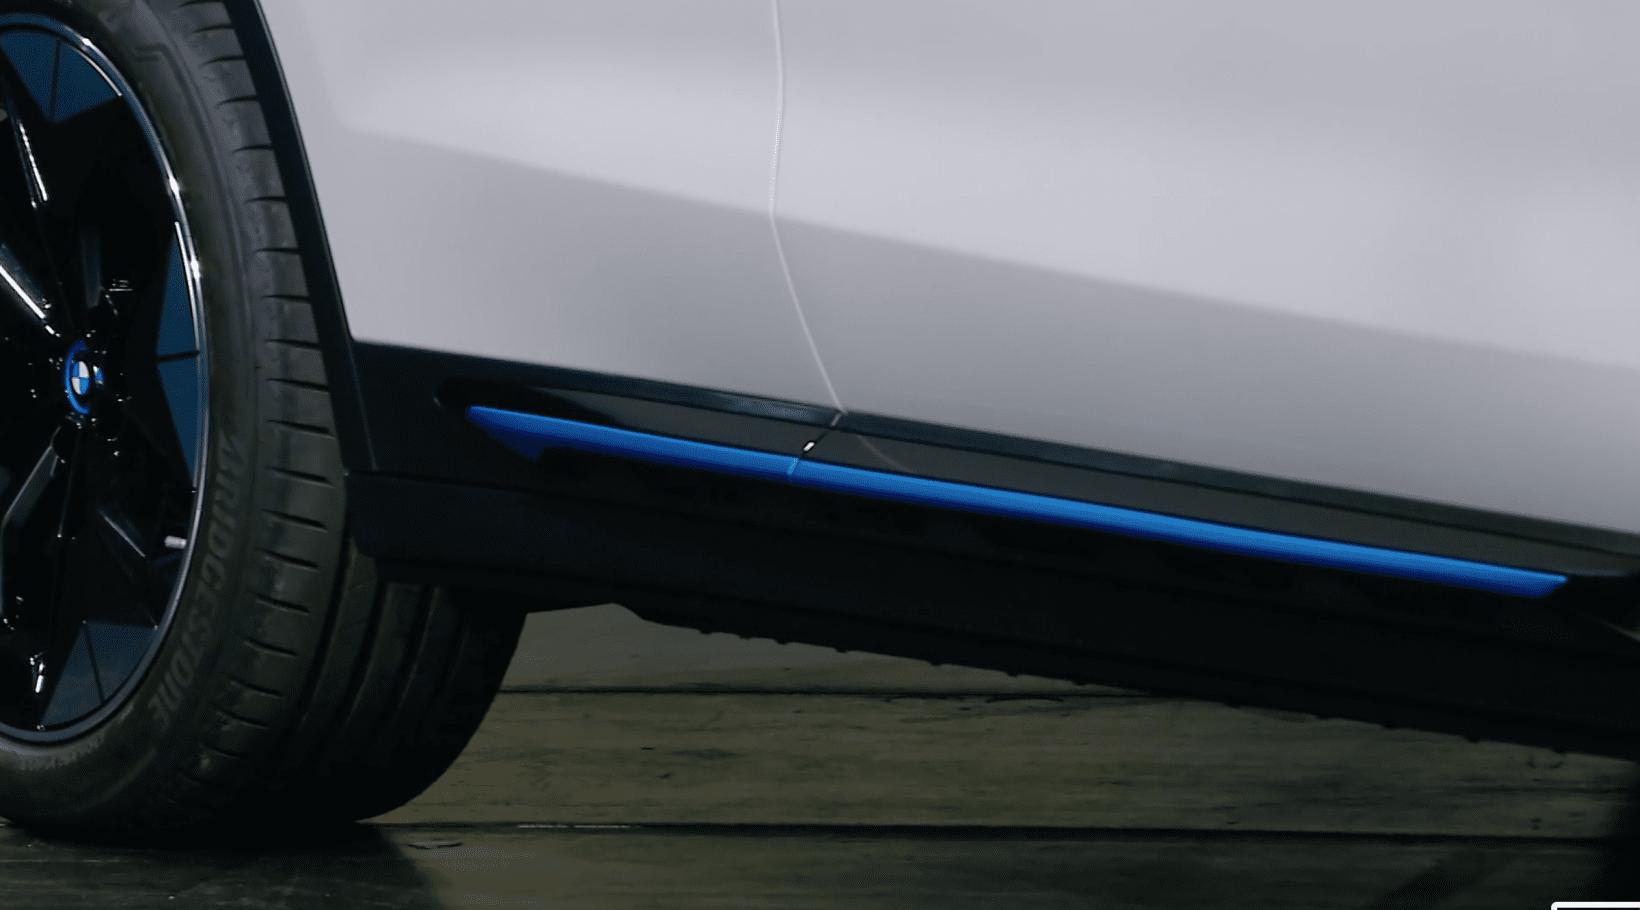 bmw, car, side runner, blue